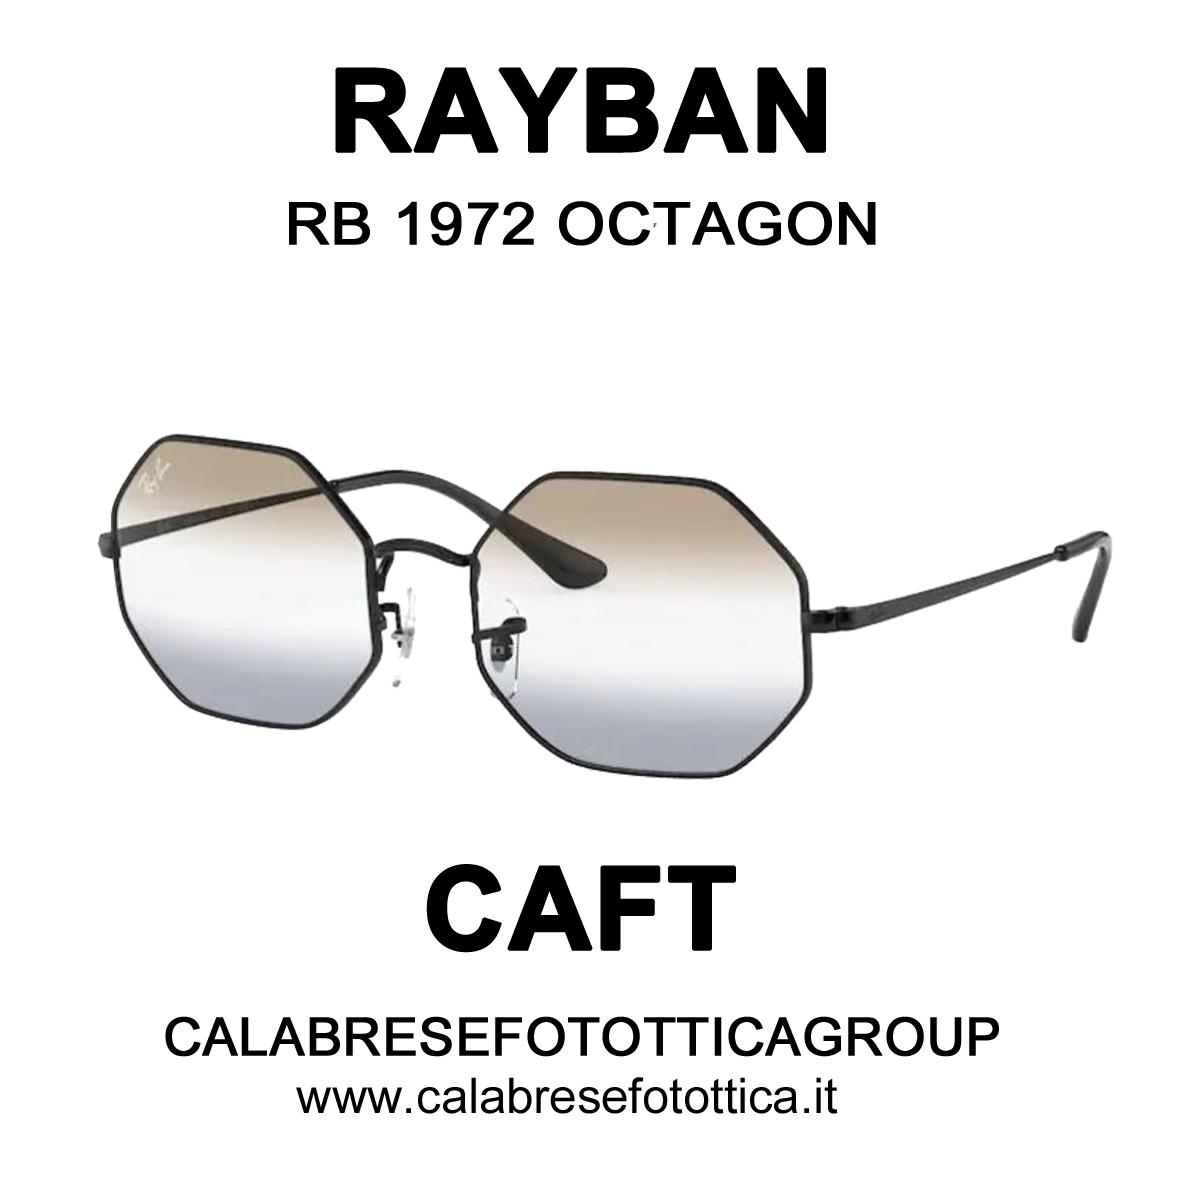 RAYBAN SOLE RB 1972 OCTAGON DA CAFT CALABRESE FOTOTTICA GROUP VIA EMILIA 68/72 SAN LAZZARO DI SAVENA